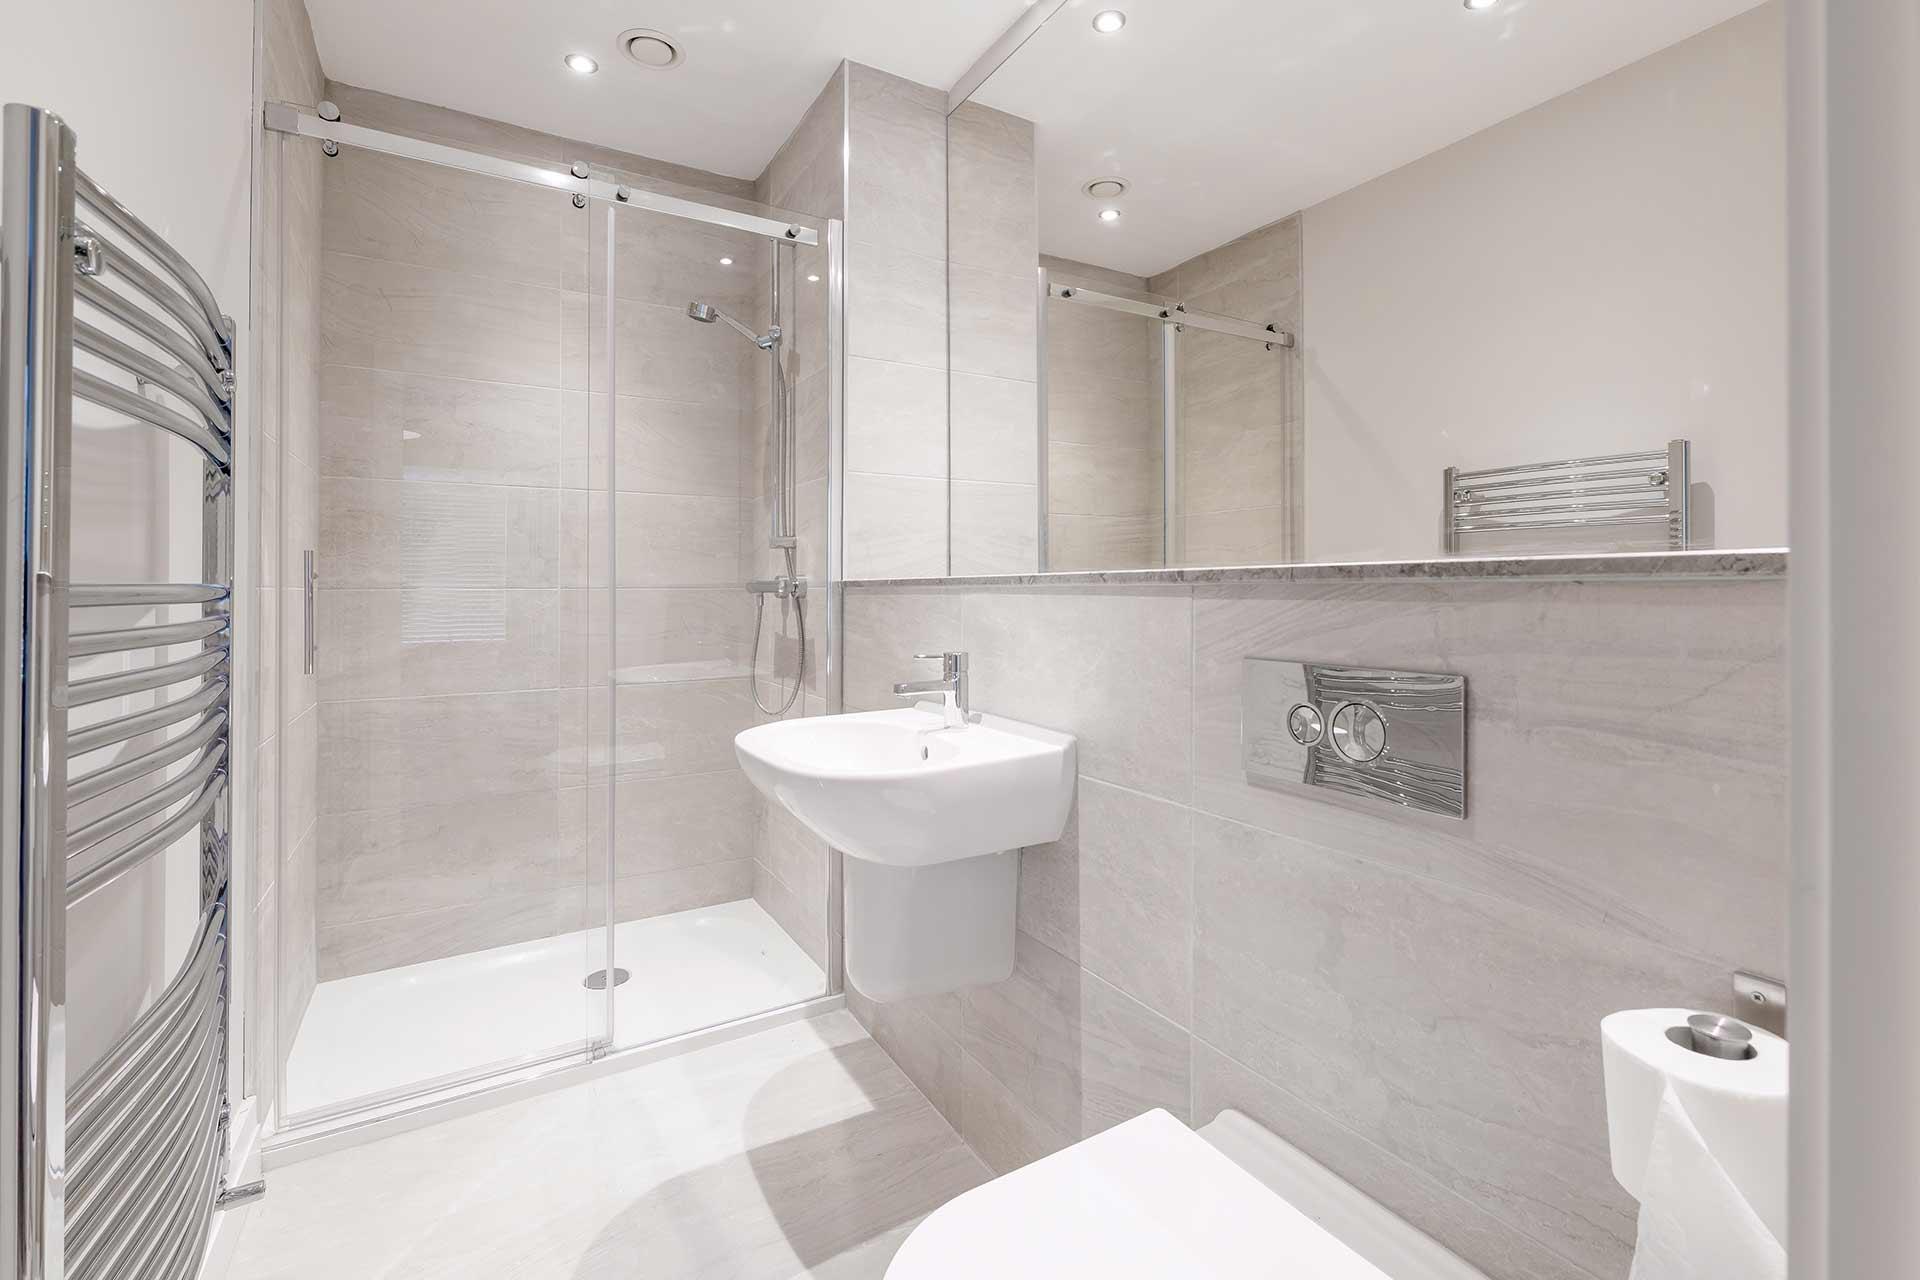 Small Bathroom Ideas Smart Design Solutions Checkatrade Blog